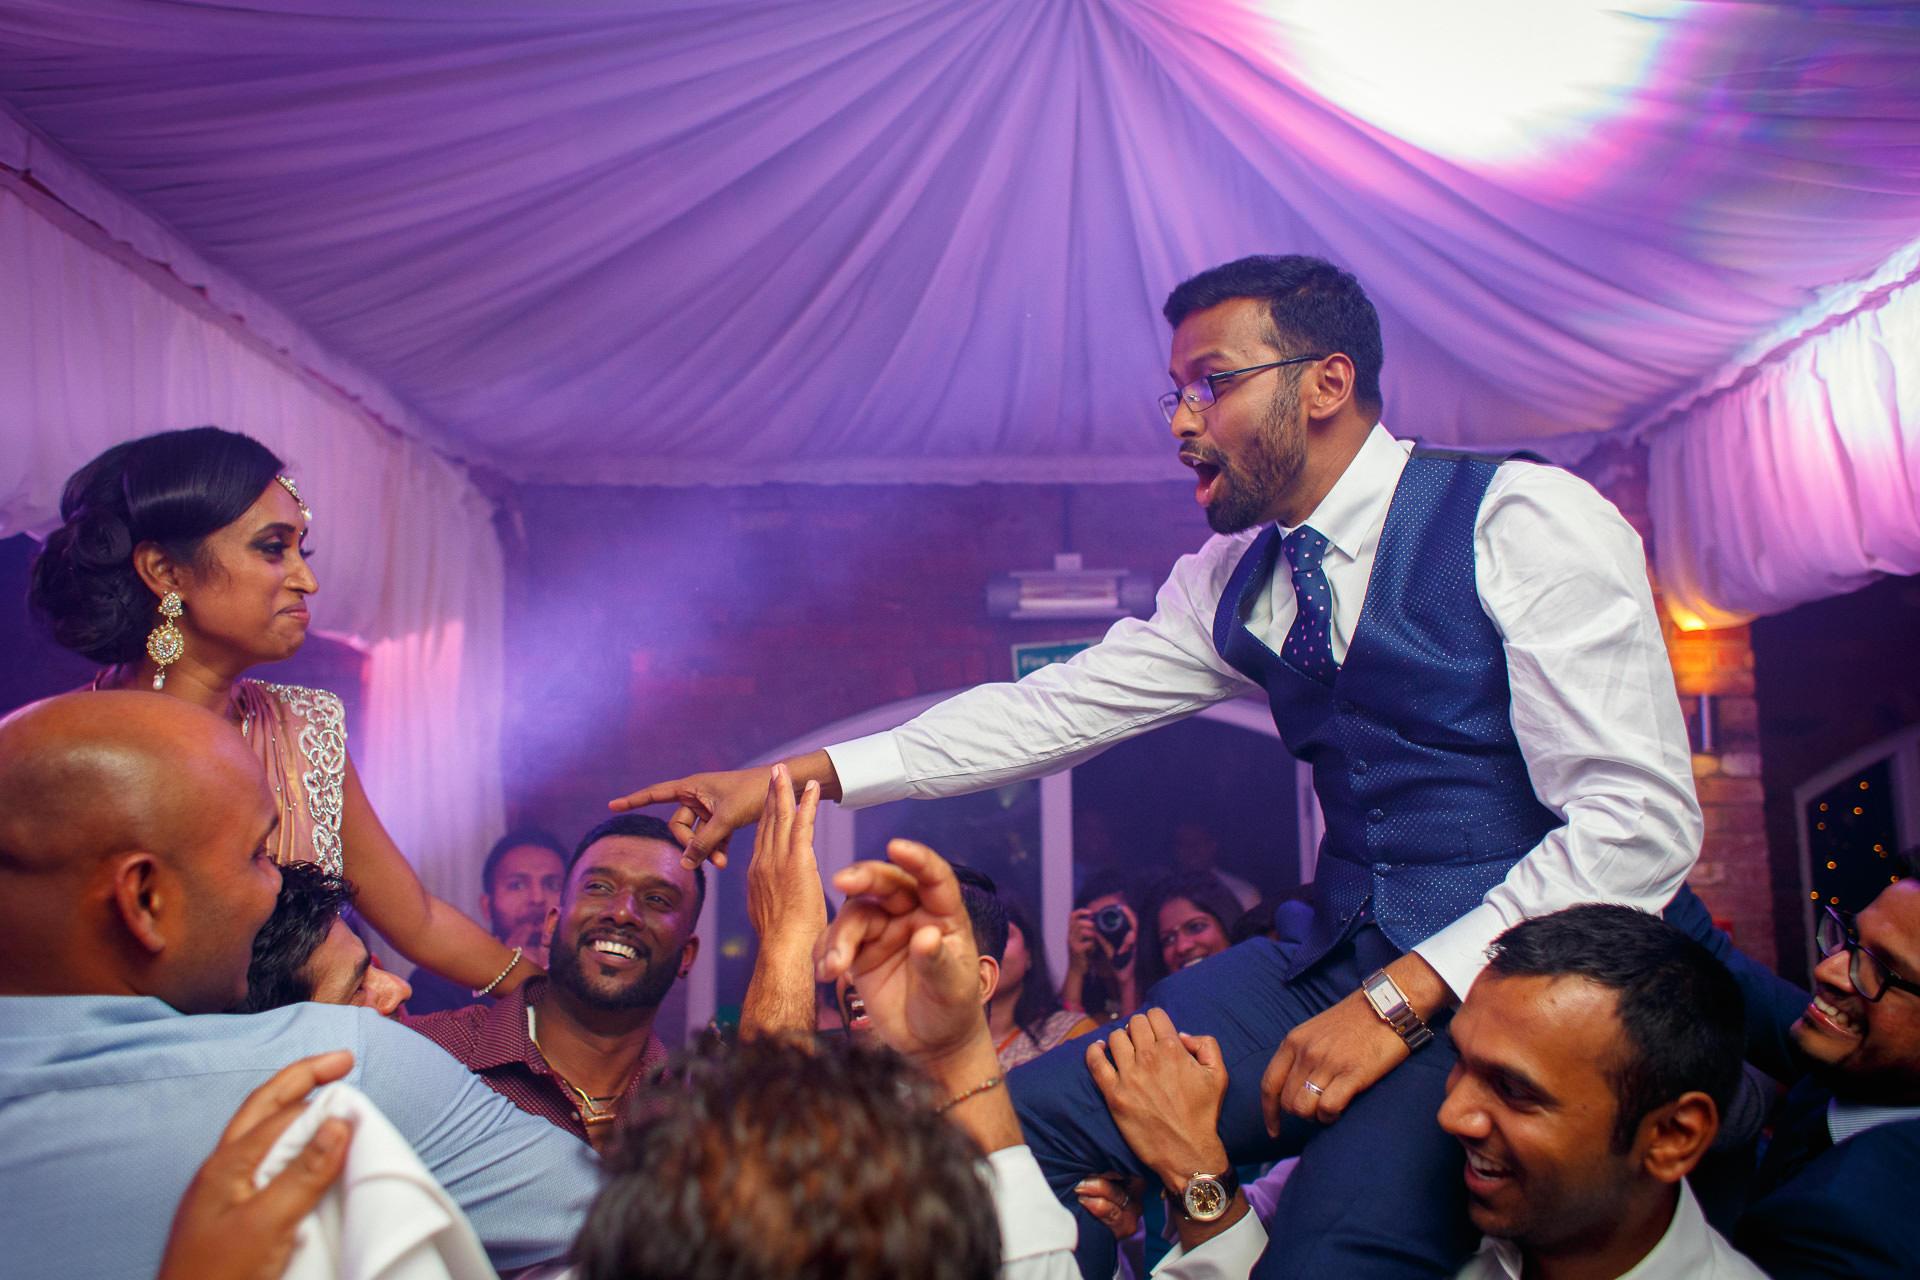 Tamil Wedding Party Photo